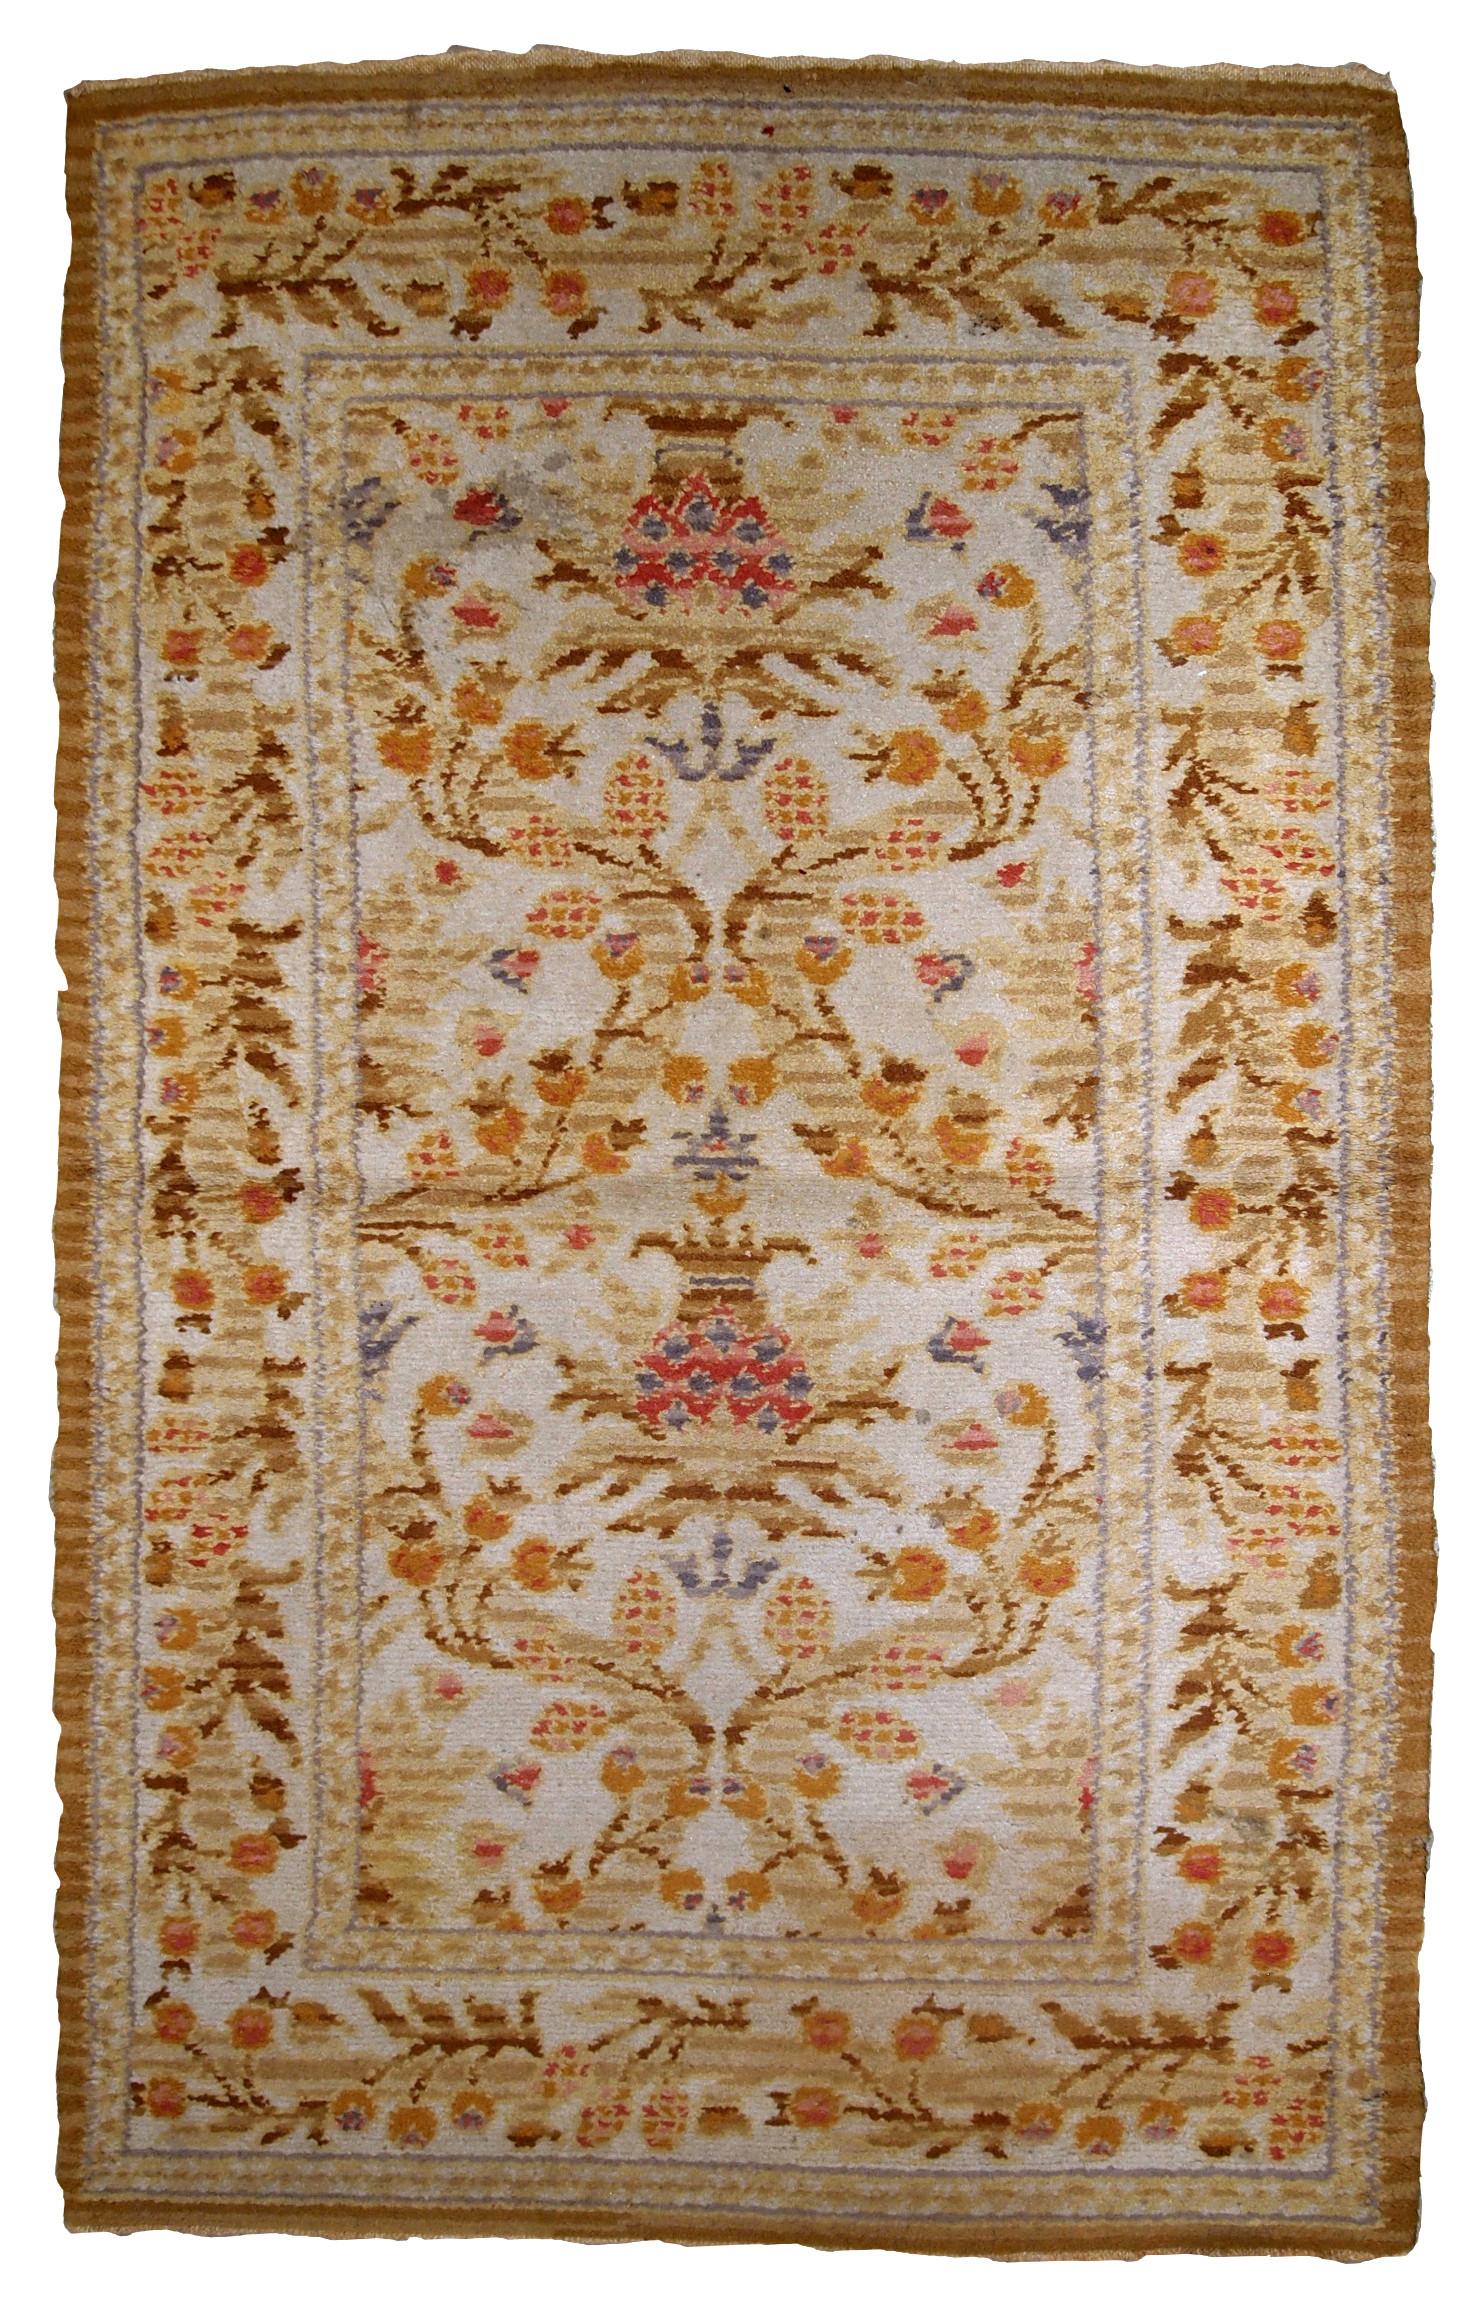 Handmade Antique Spanish Savonnerie Rug